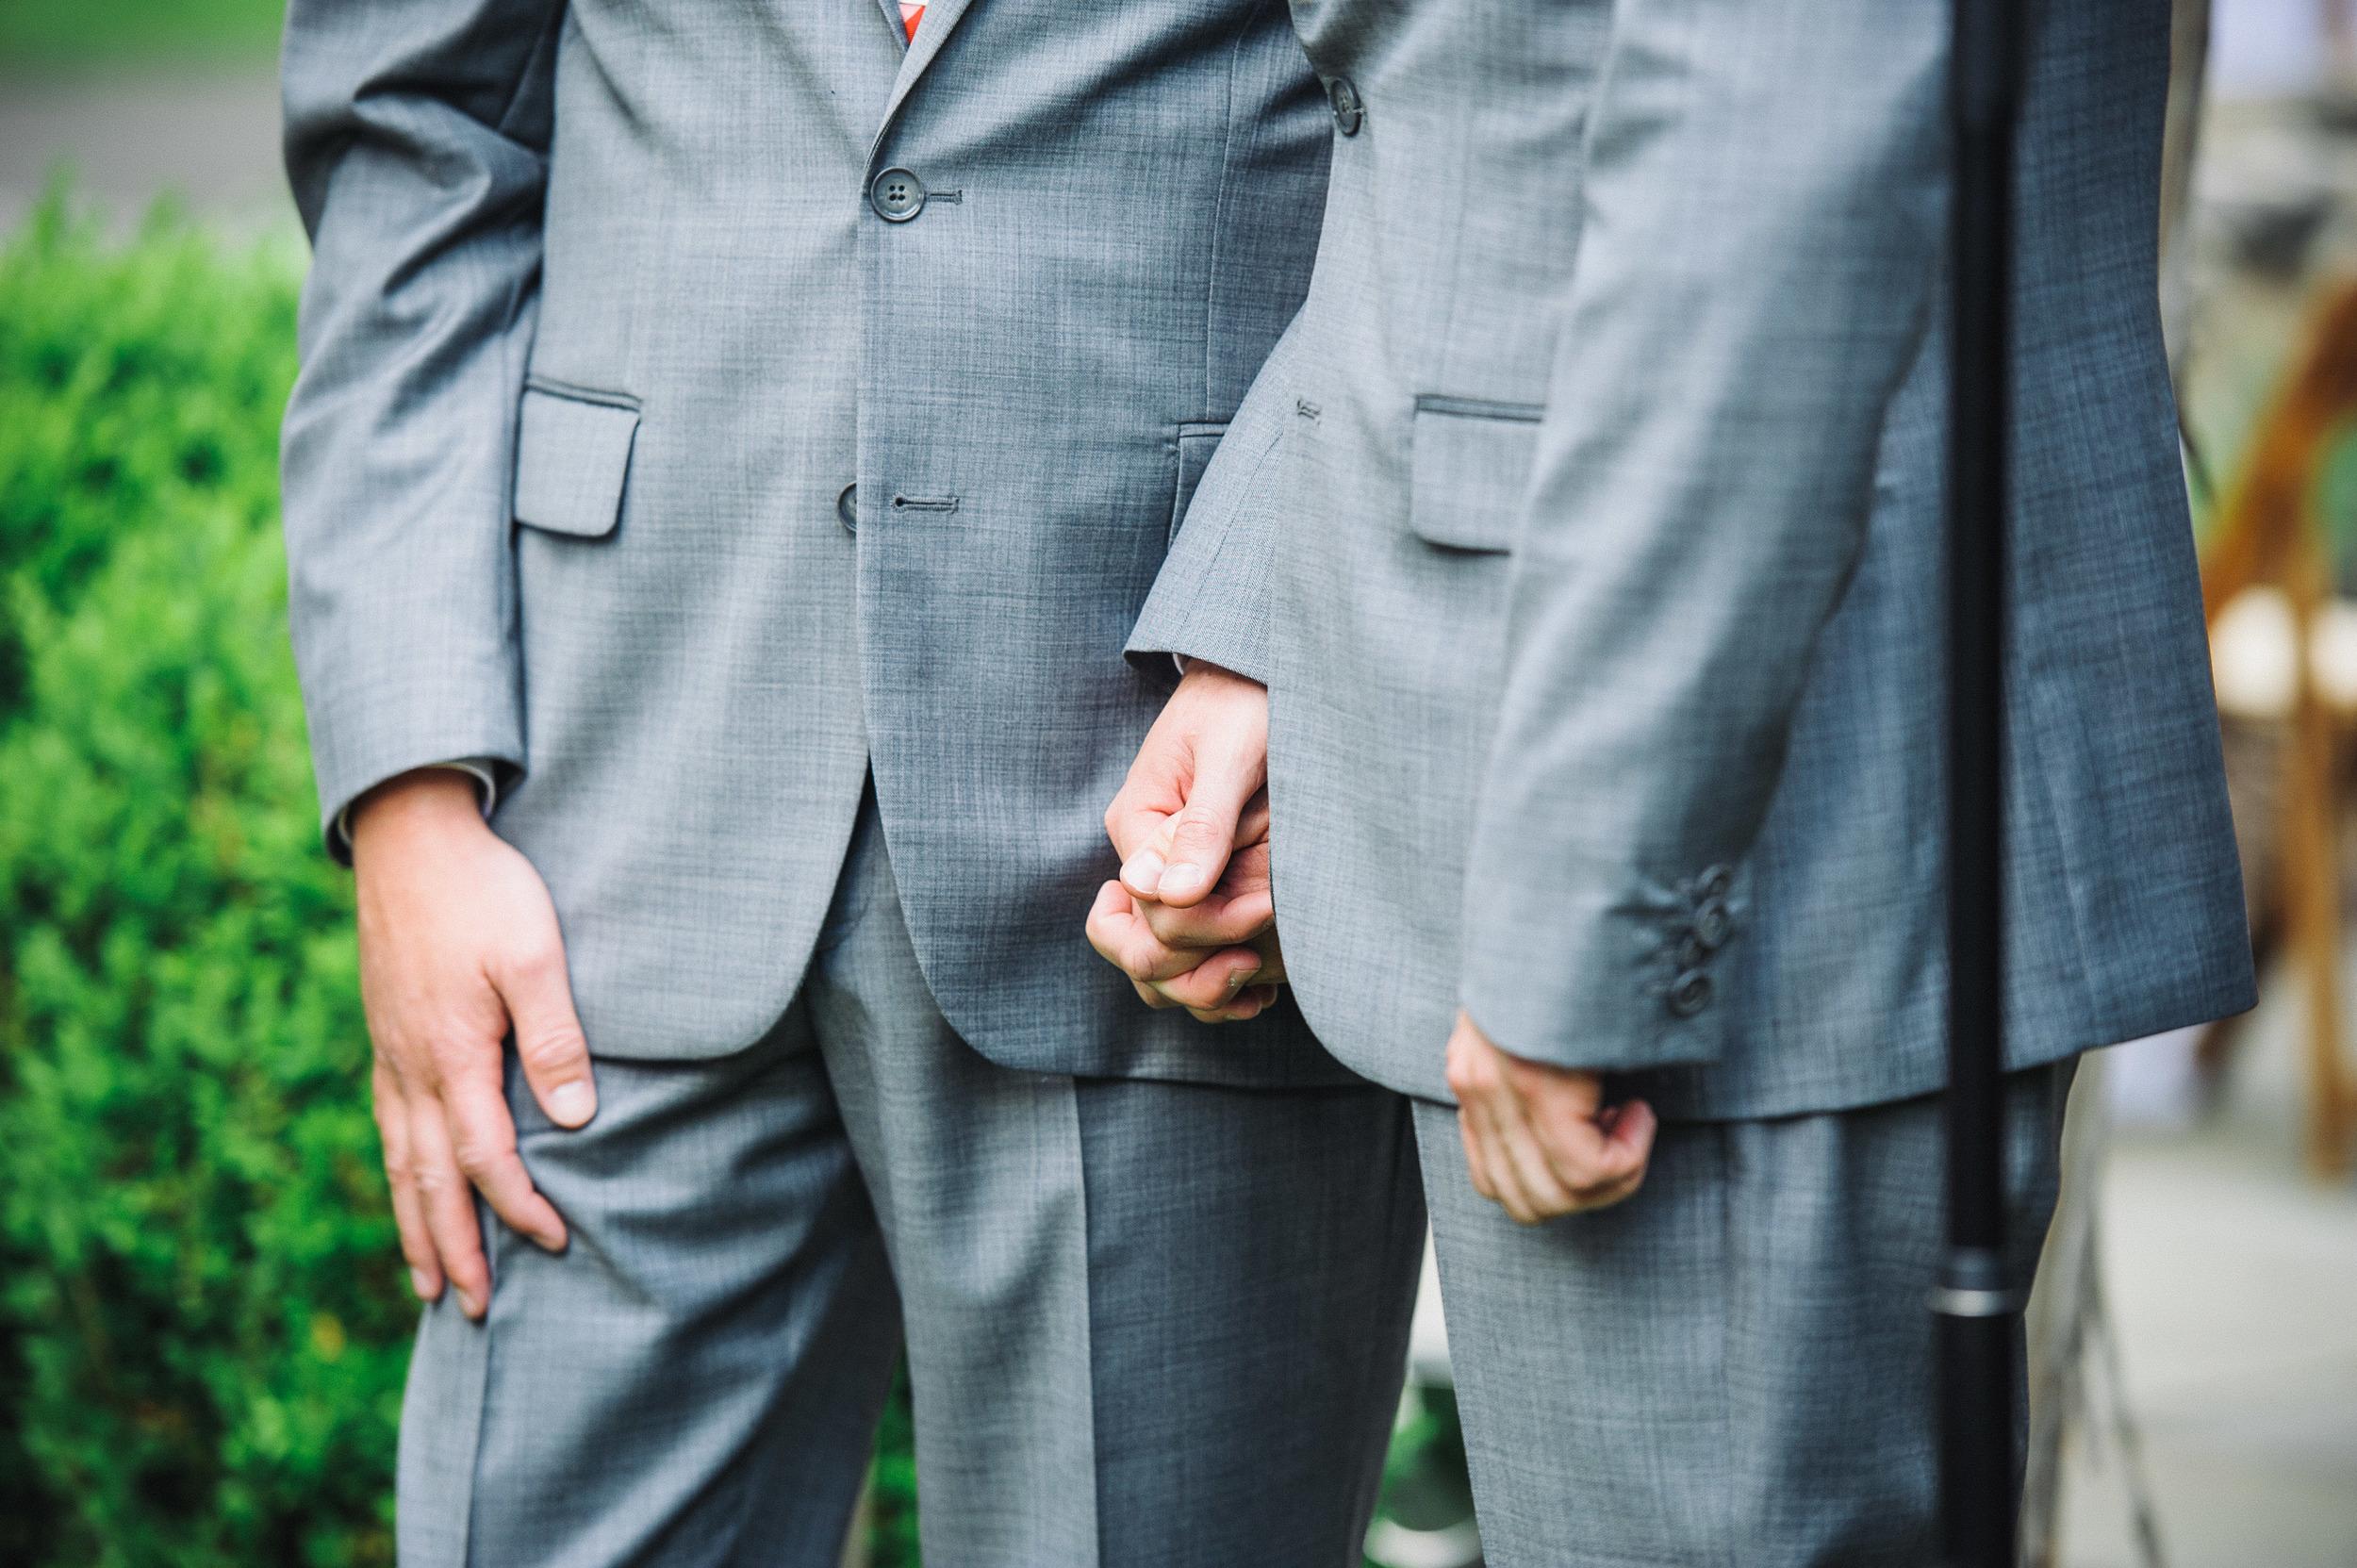 Same Sex Wedding CT Gay Wedding LGBT Wedding088.JPG